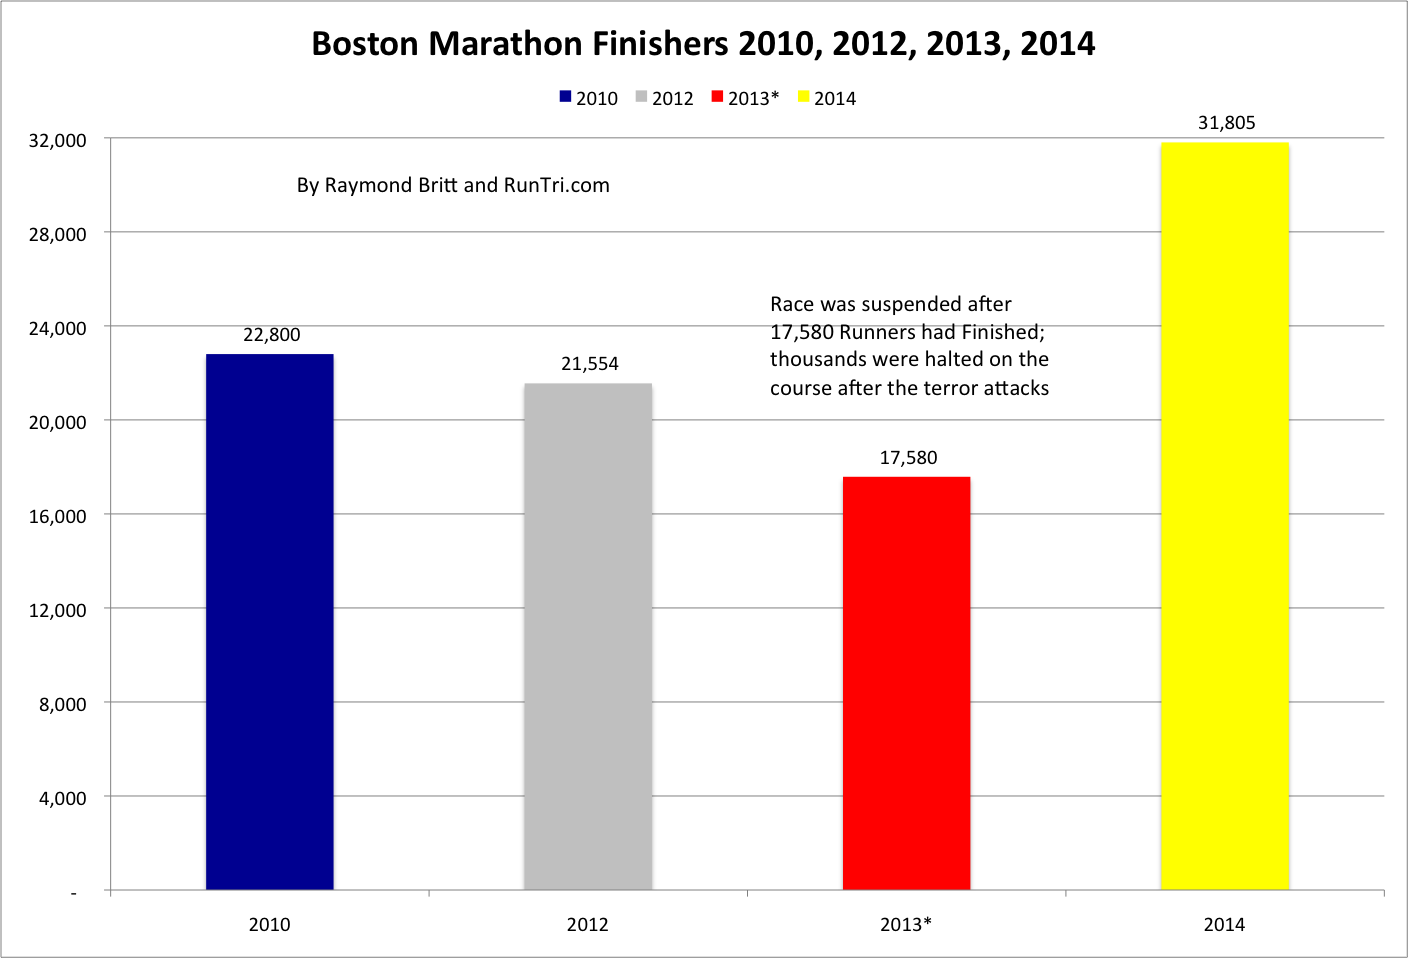 Boston+Marathon+Finishers+2010,+2012,+2013,+2014+by+Raymond+Britt Chicago Marathon Map on baja 1000 map, beach to beacon map, big 12 conference map, dakar map, daytona 500 map, bolder boulder map, bay to breakers map,